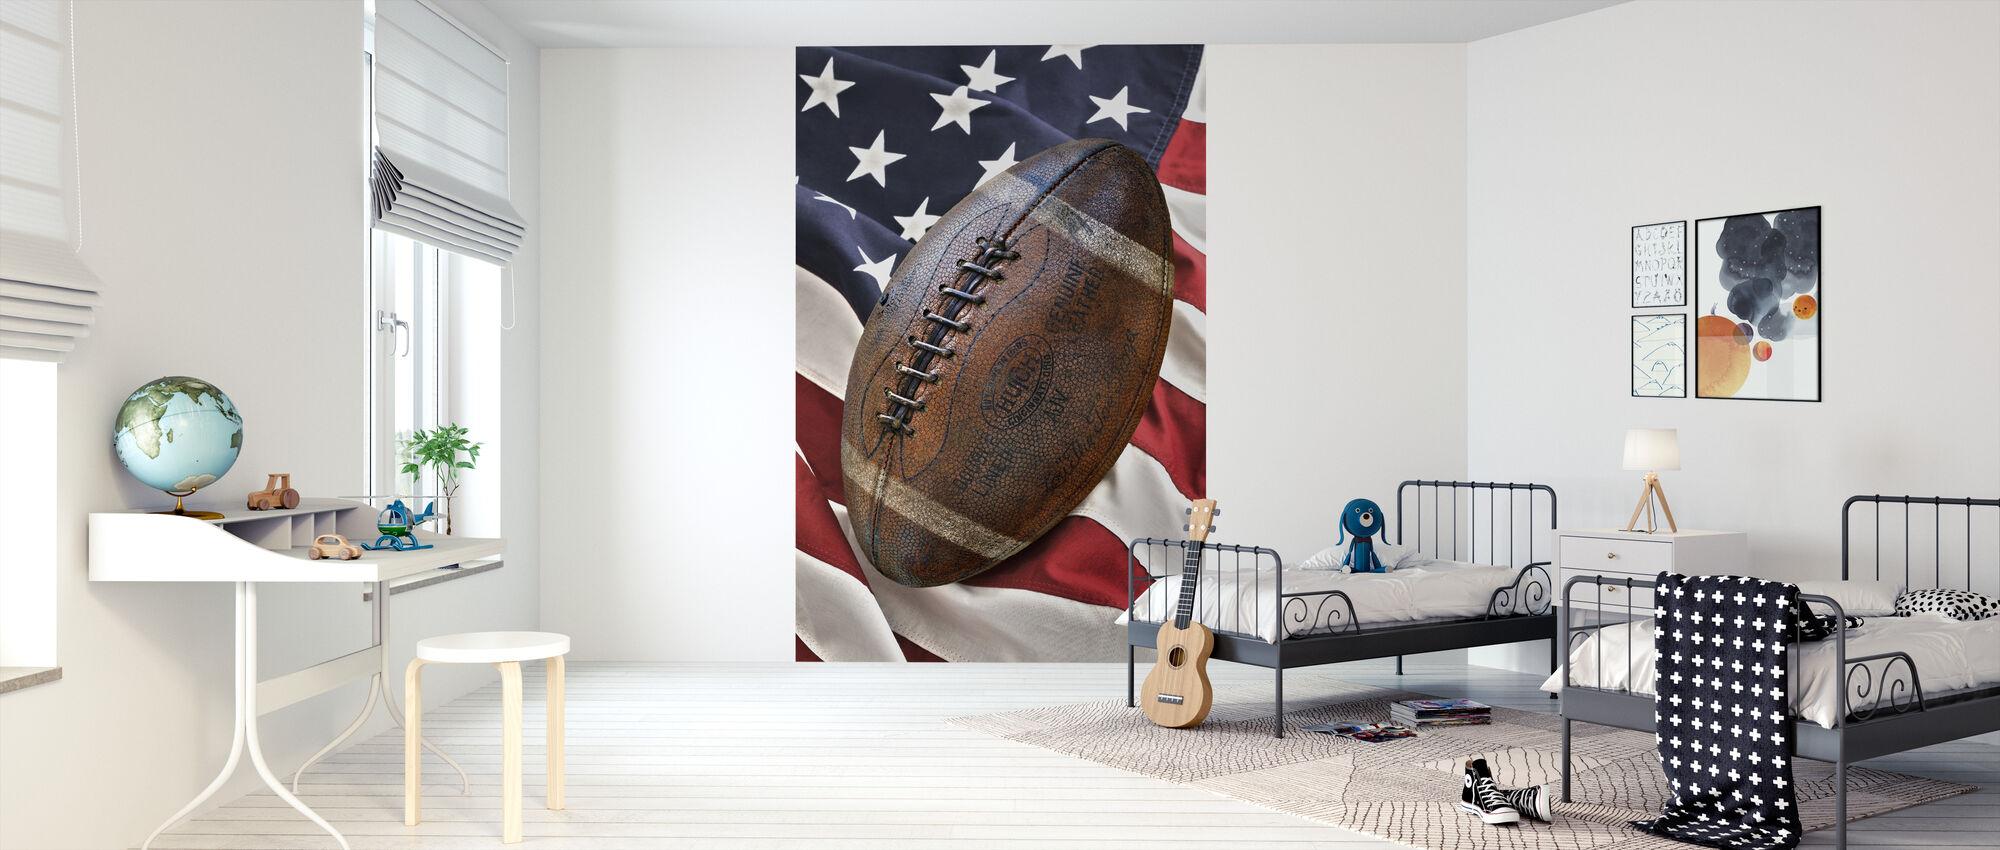 Vintage voetbal - Behang - Kinderkamer